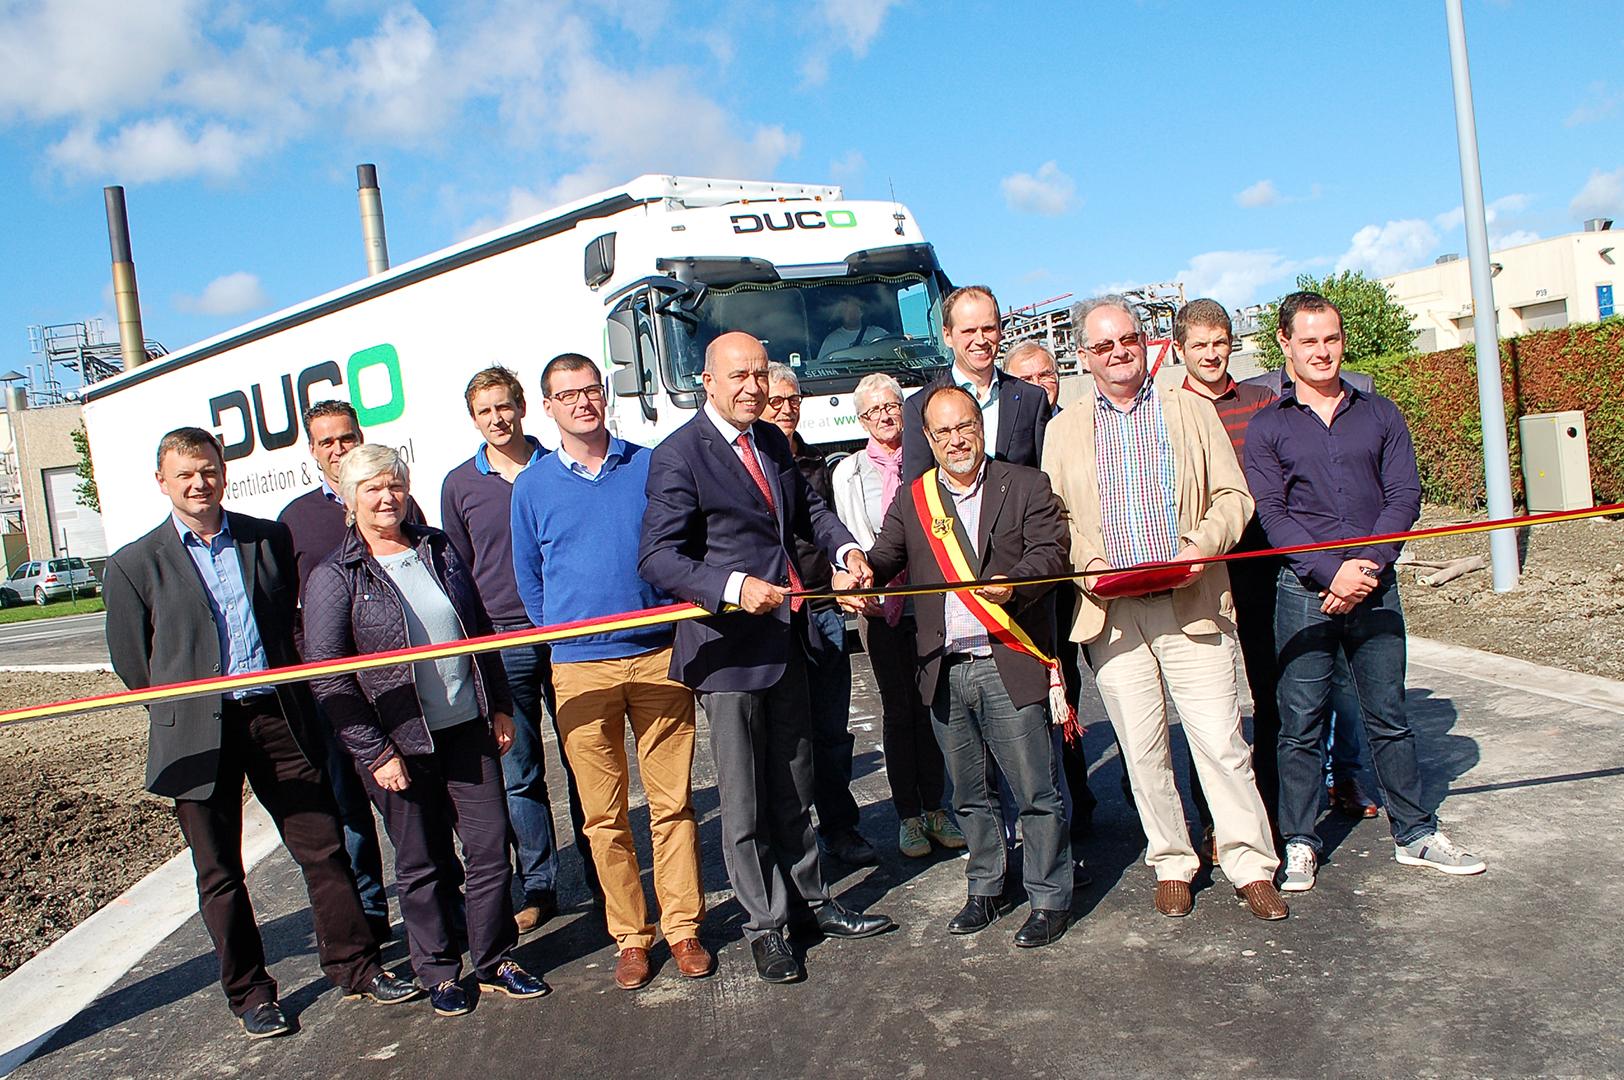 Opening nieuwe weg - Duco